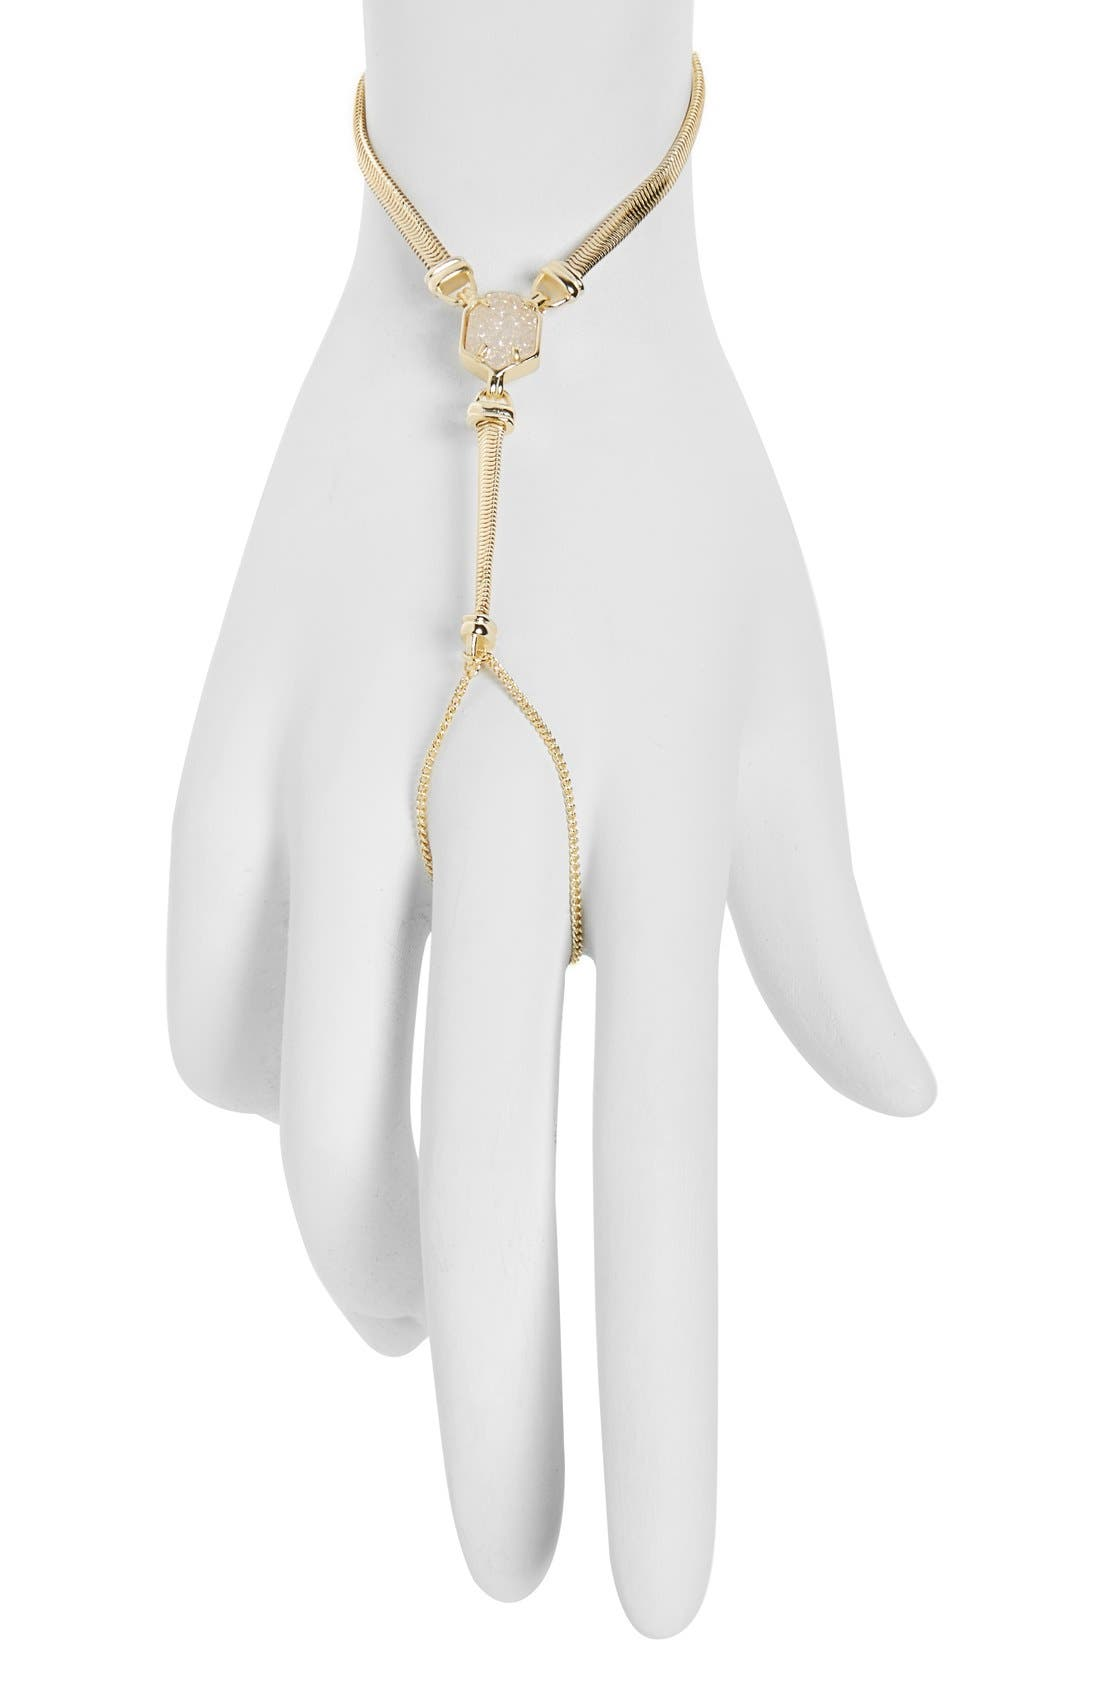 Alternate Image 1 Selected - Kendra Scott 'Carlin' Hand Chain